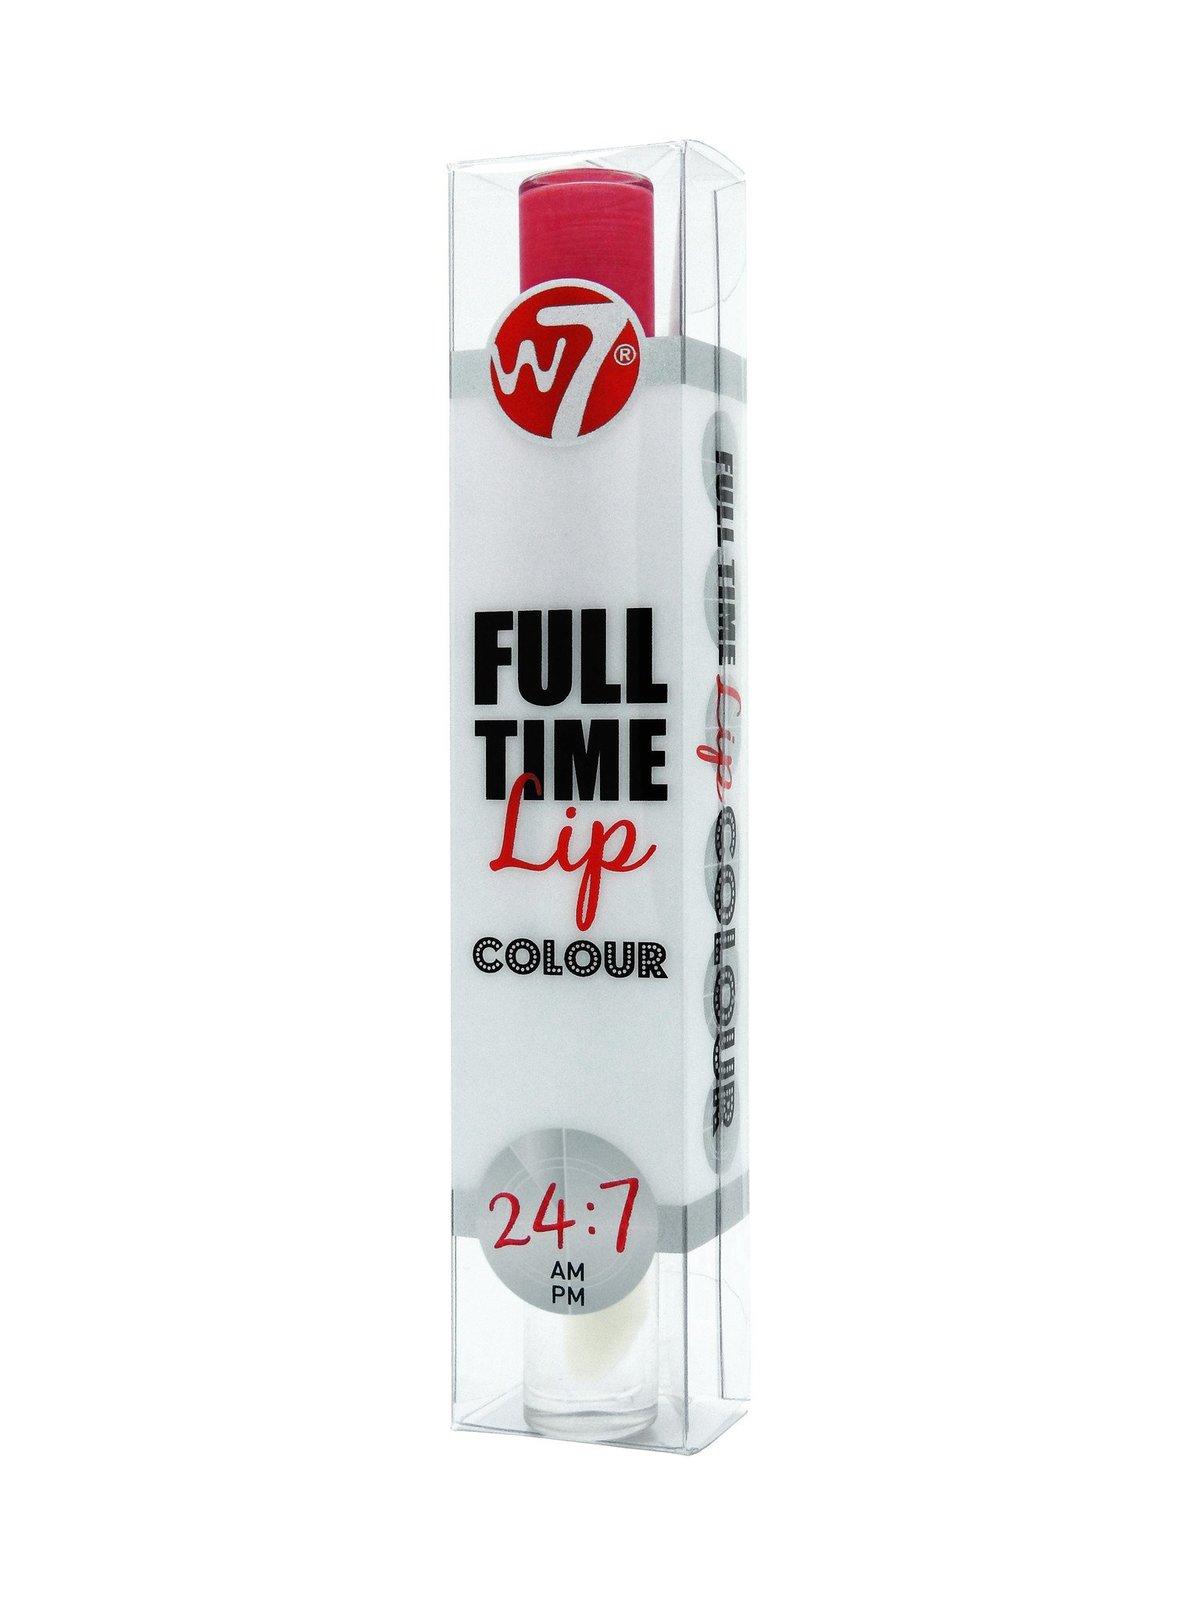 W7 Full Time Lip Colour (Passionate) image